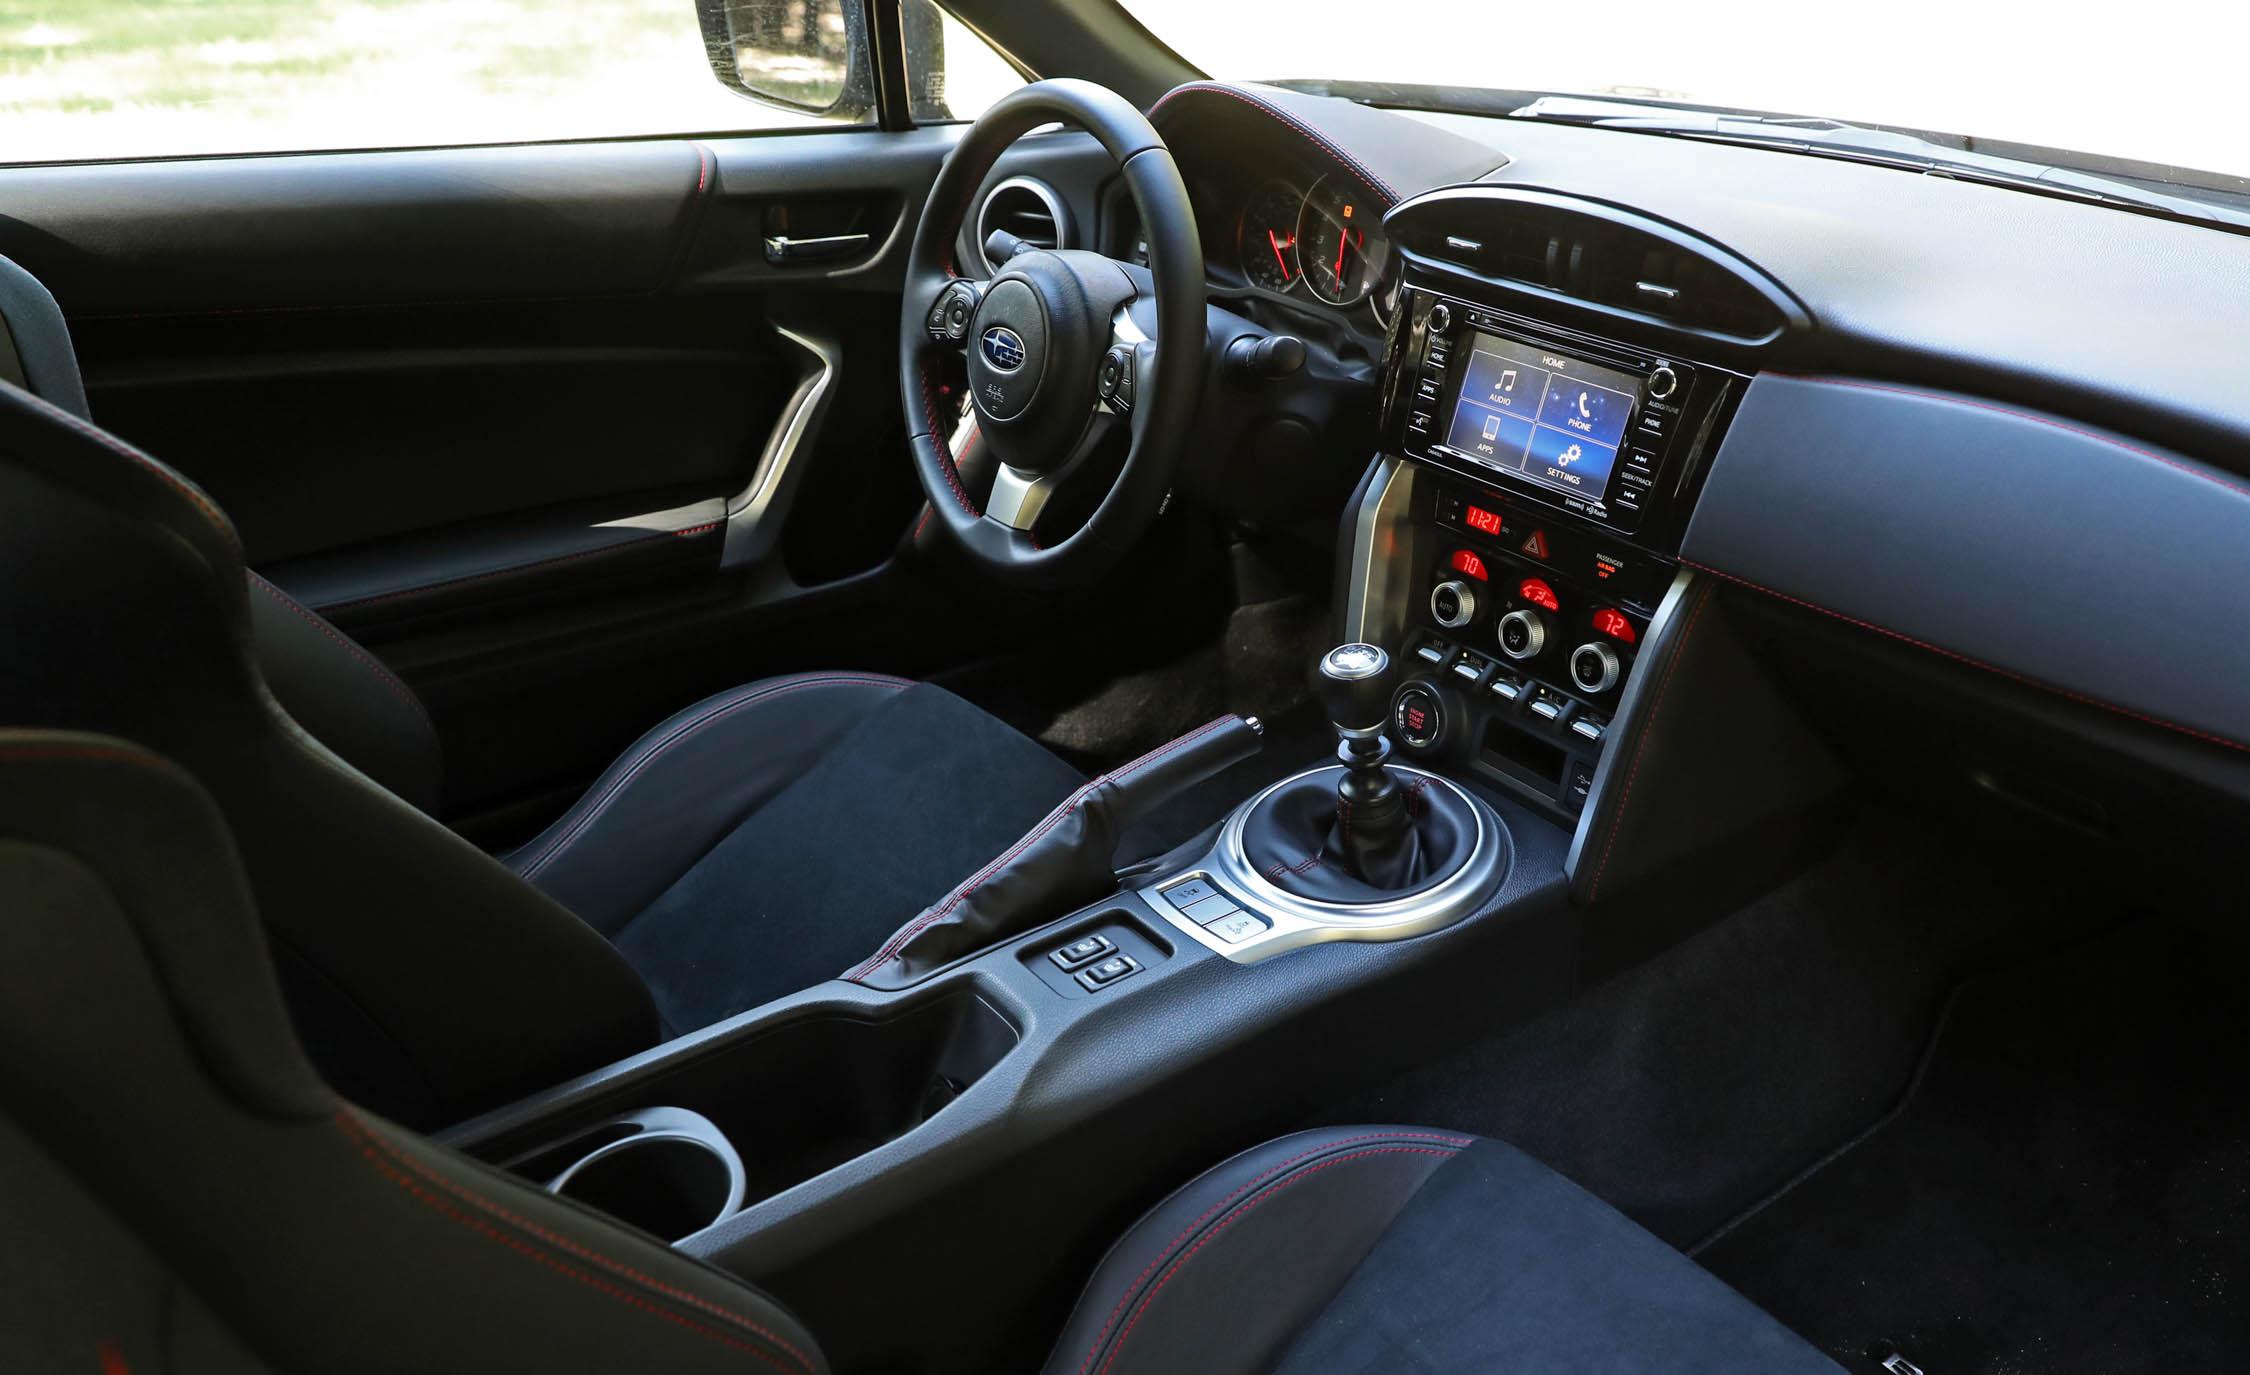 2017 Subaru BRZ Interior (Photo 17 of 27)